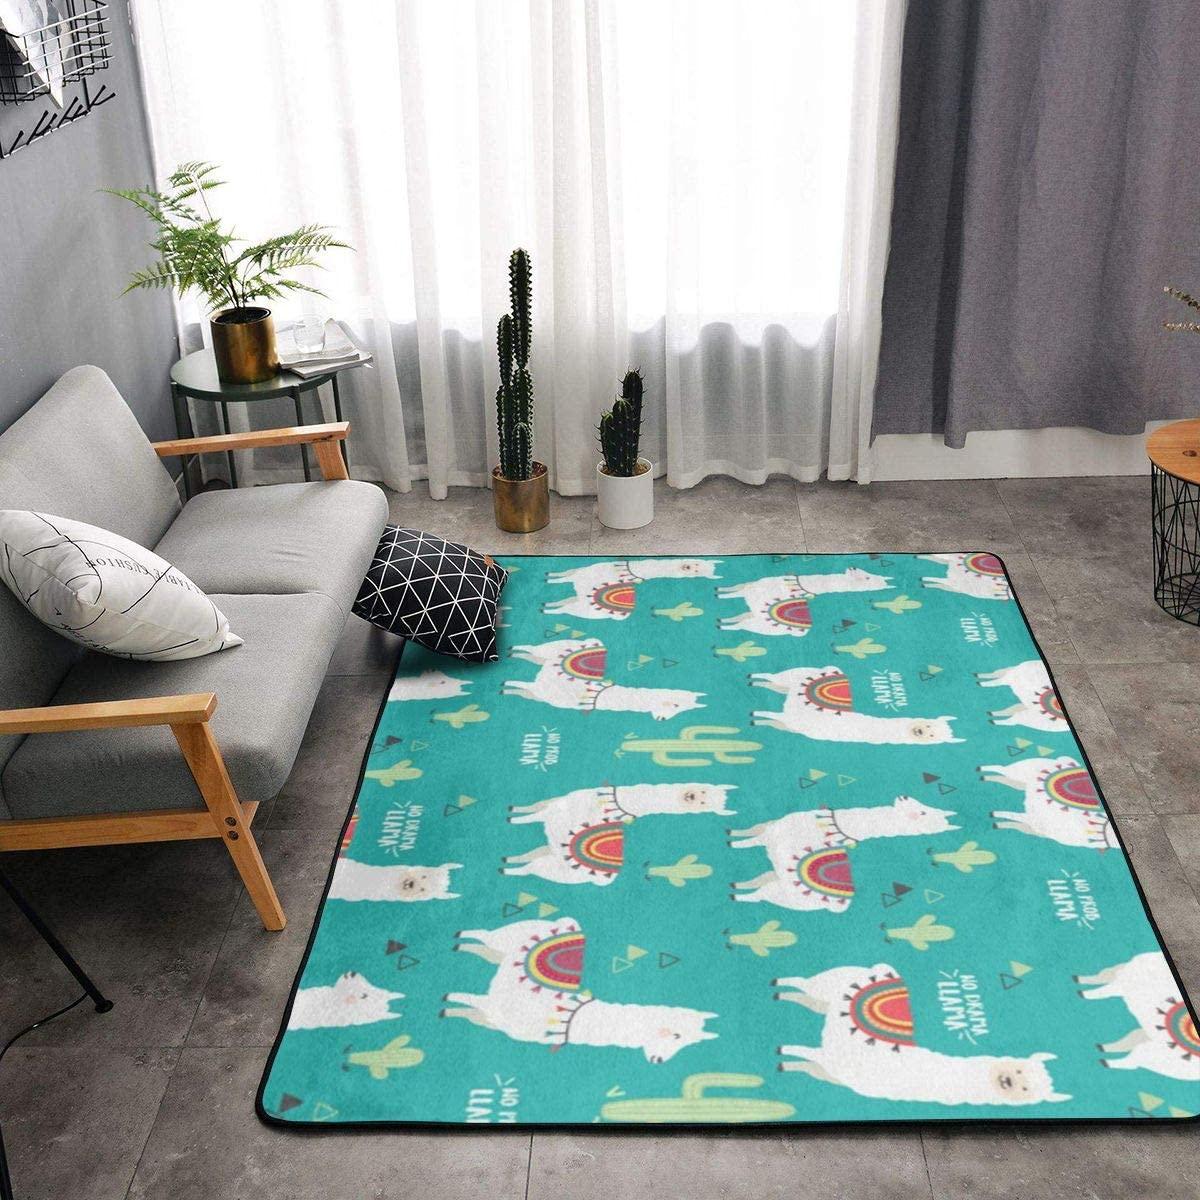 Area Rug Soft Fluffy Carpet for Bedroom Kids Teens Room, Modern Floor Mat Oversize Door Mat Plush Nursery Rugs for Boys Girls 80x58 in,Llama Cactus Green